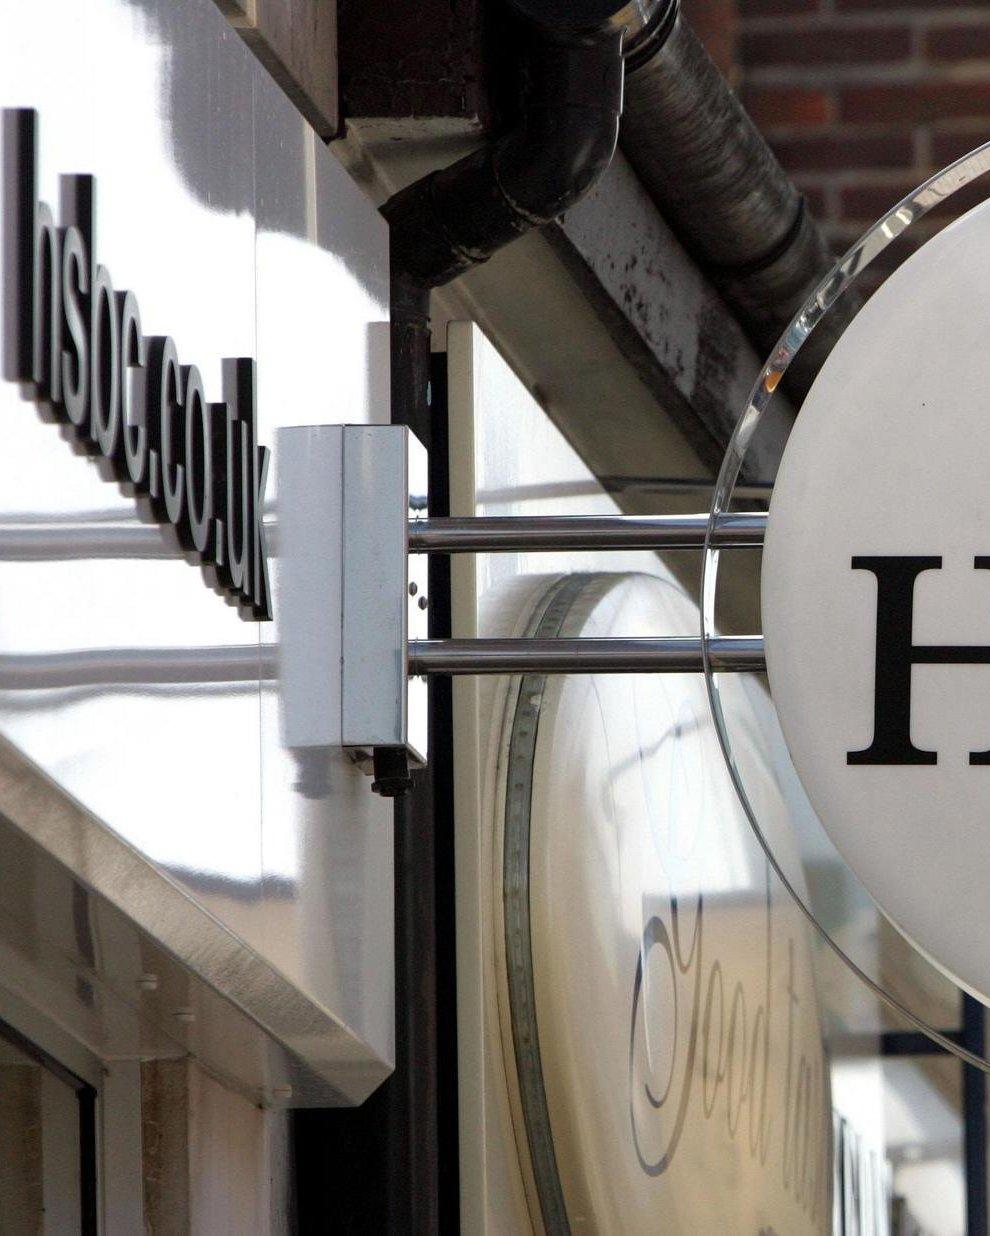 HSBC sign outside branch